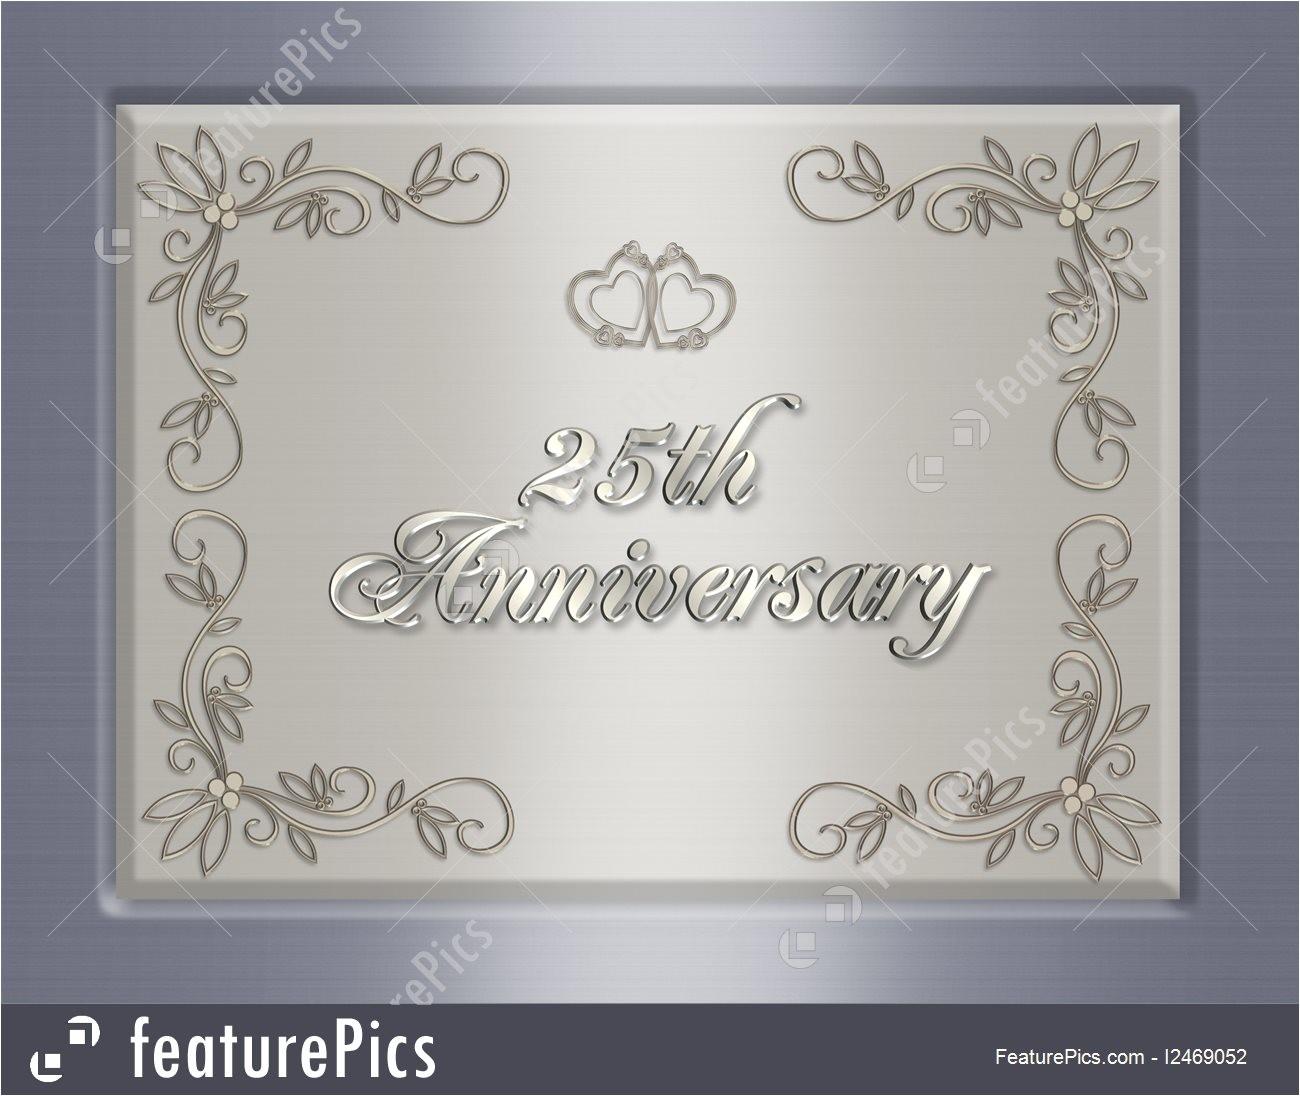 wedding anniversary invitation 1469052